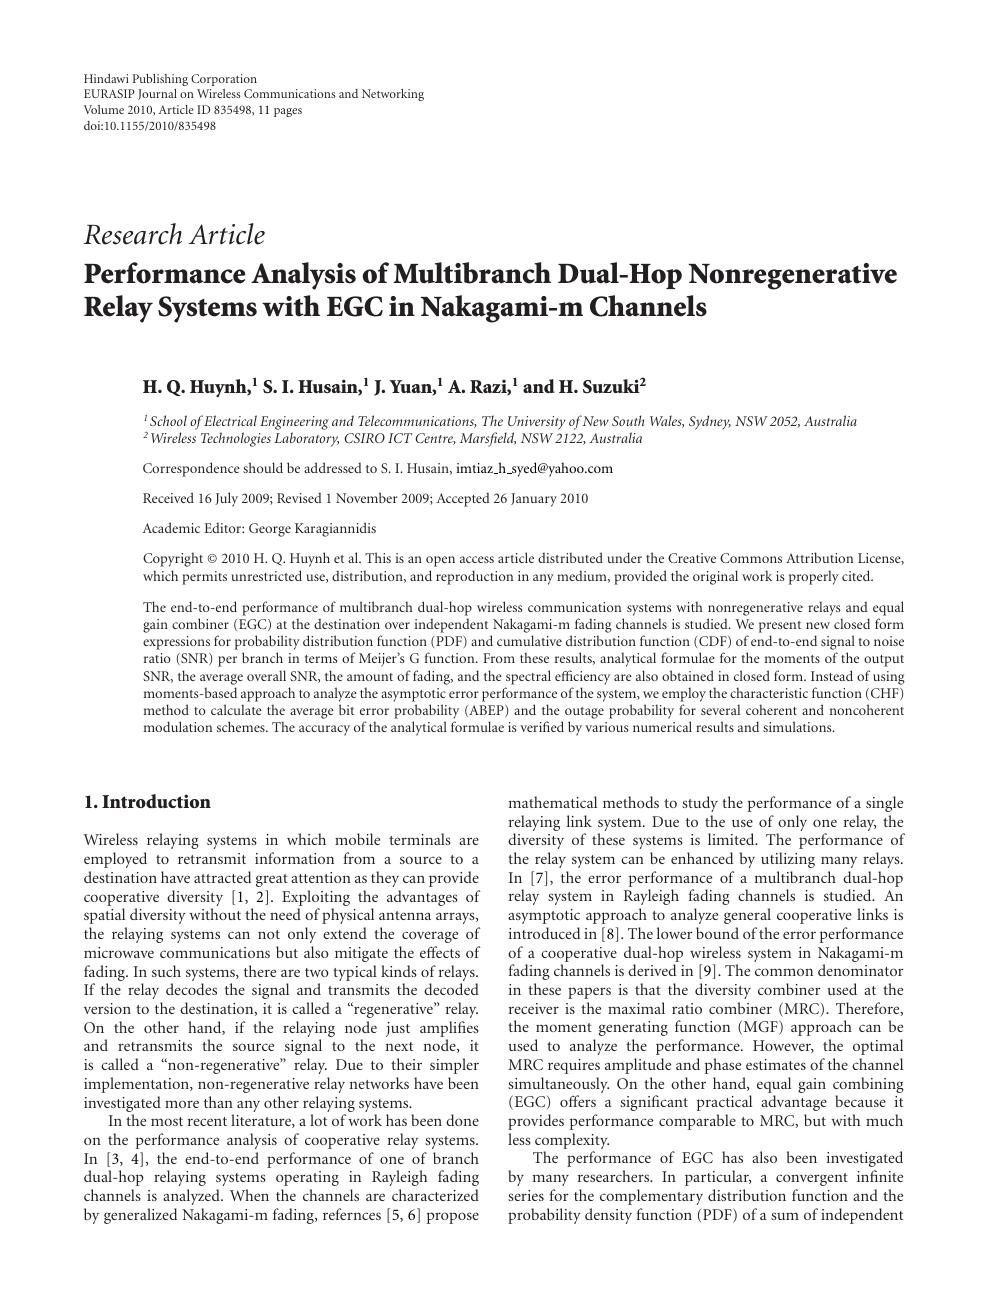 Performance Analysis Of Multibranch Dual Hop Nonregenerative Relay Basic Concept Pdf Read Paper